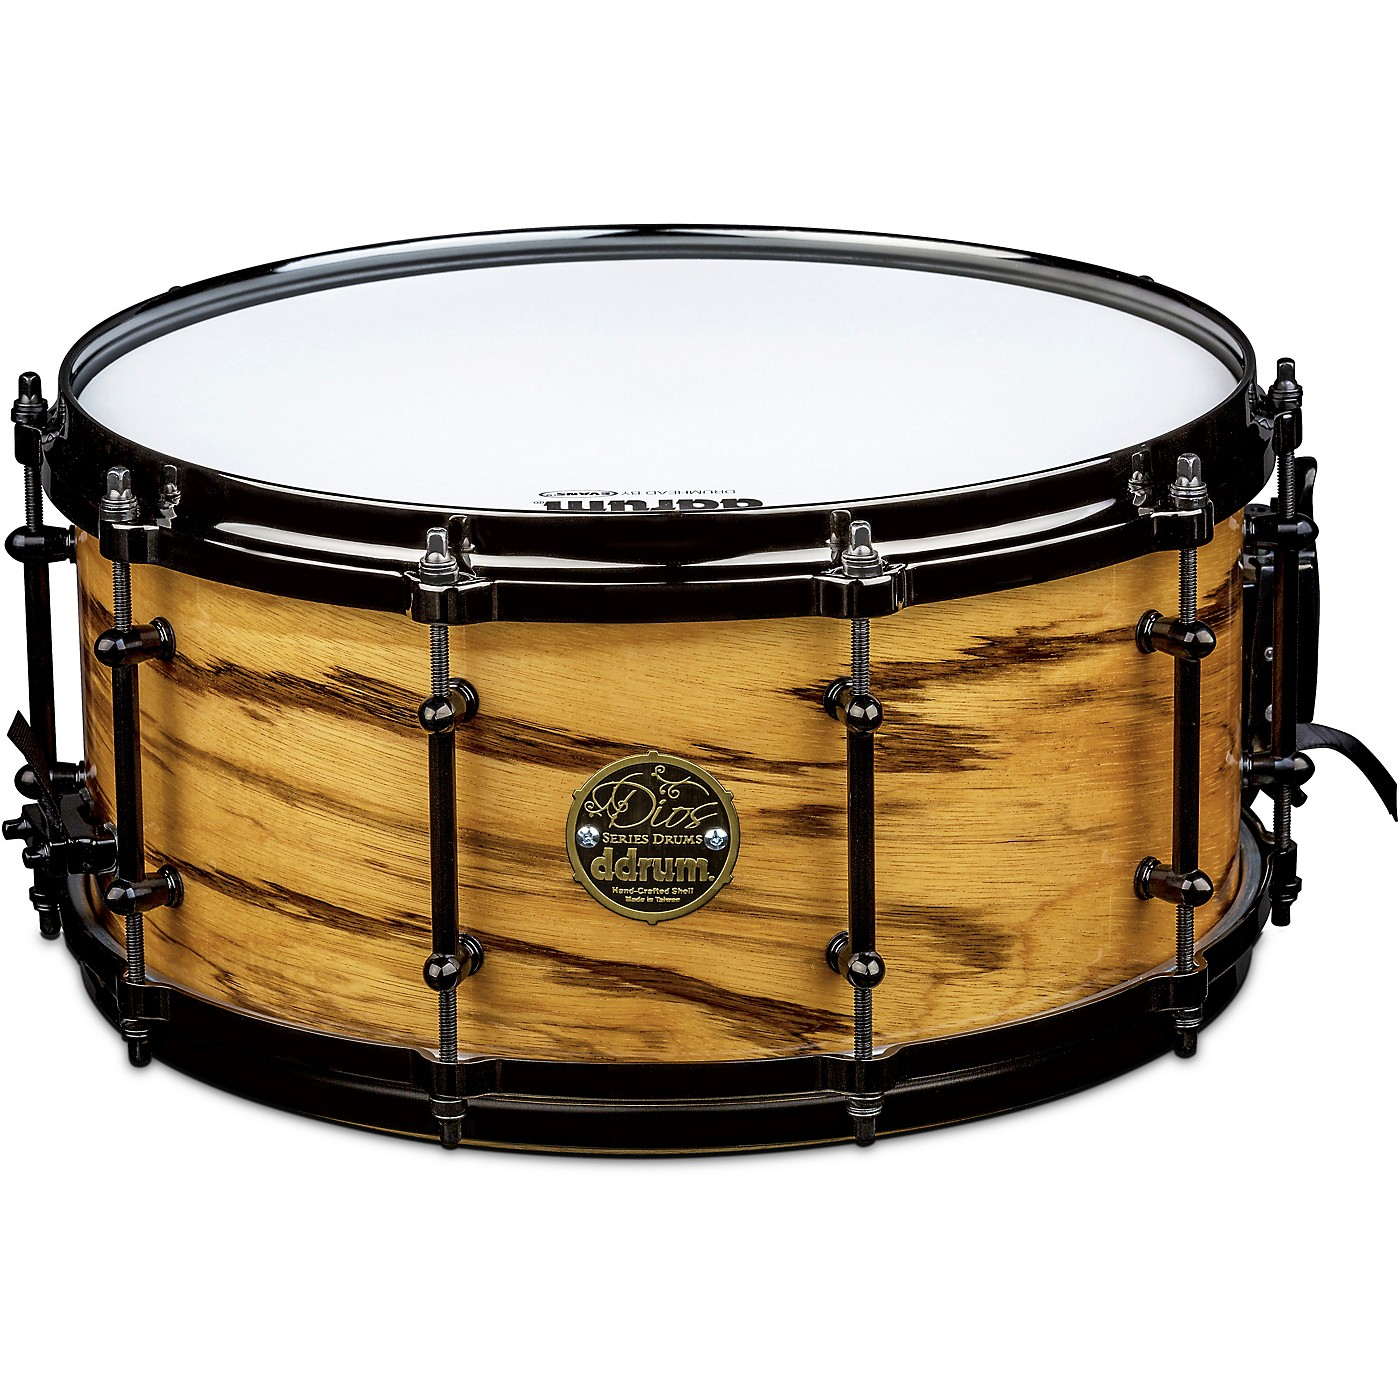 ddrum Dios Maple Snare Drum with Exotic Zebra Wood Veneer thumbnail